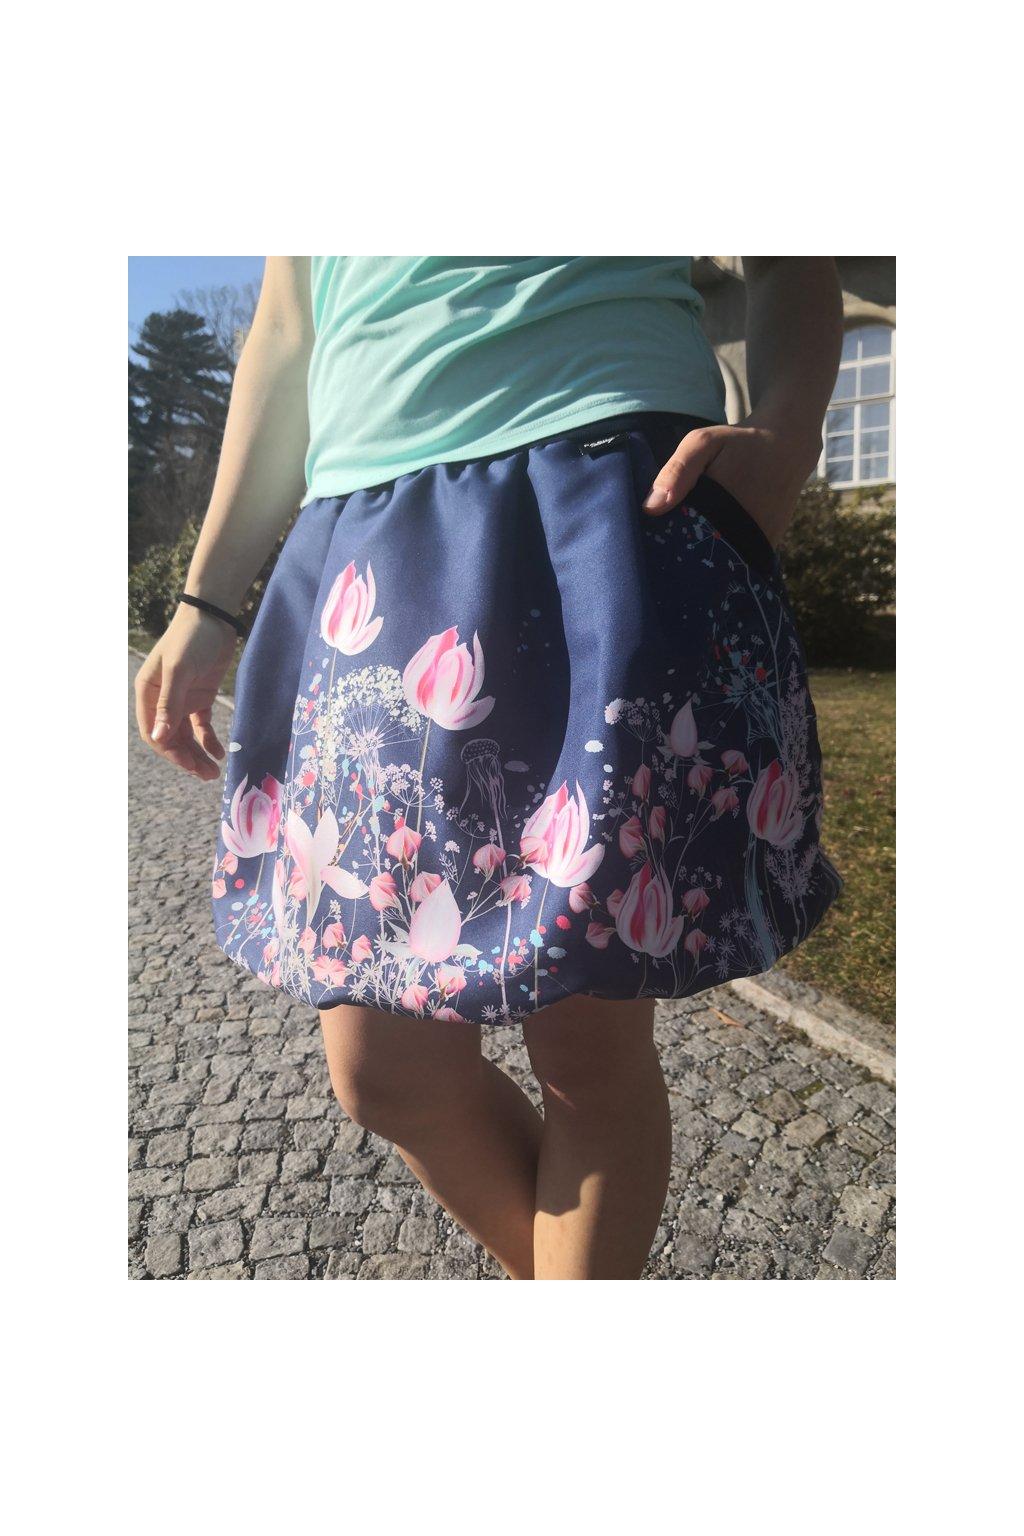 balonova sukne tulipany papilio clothing